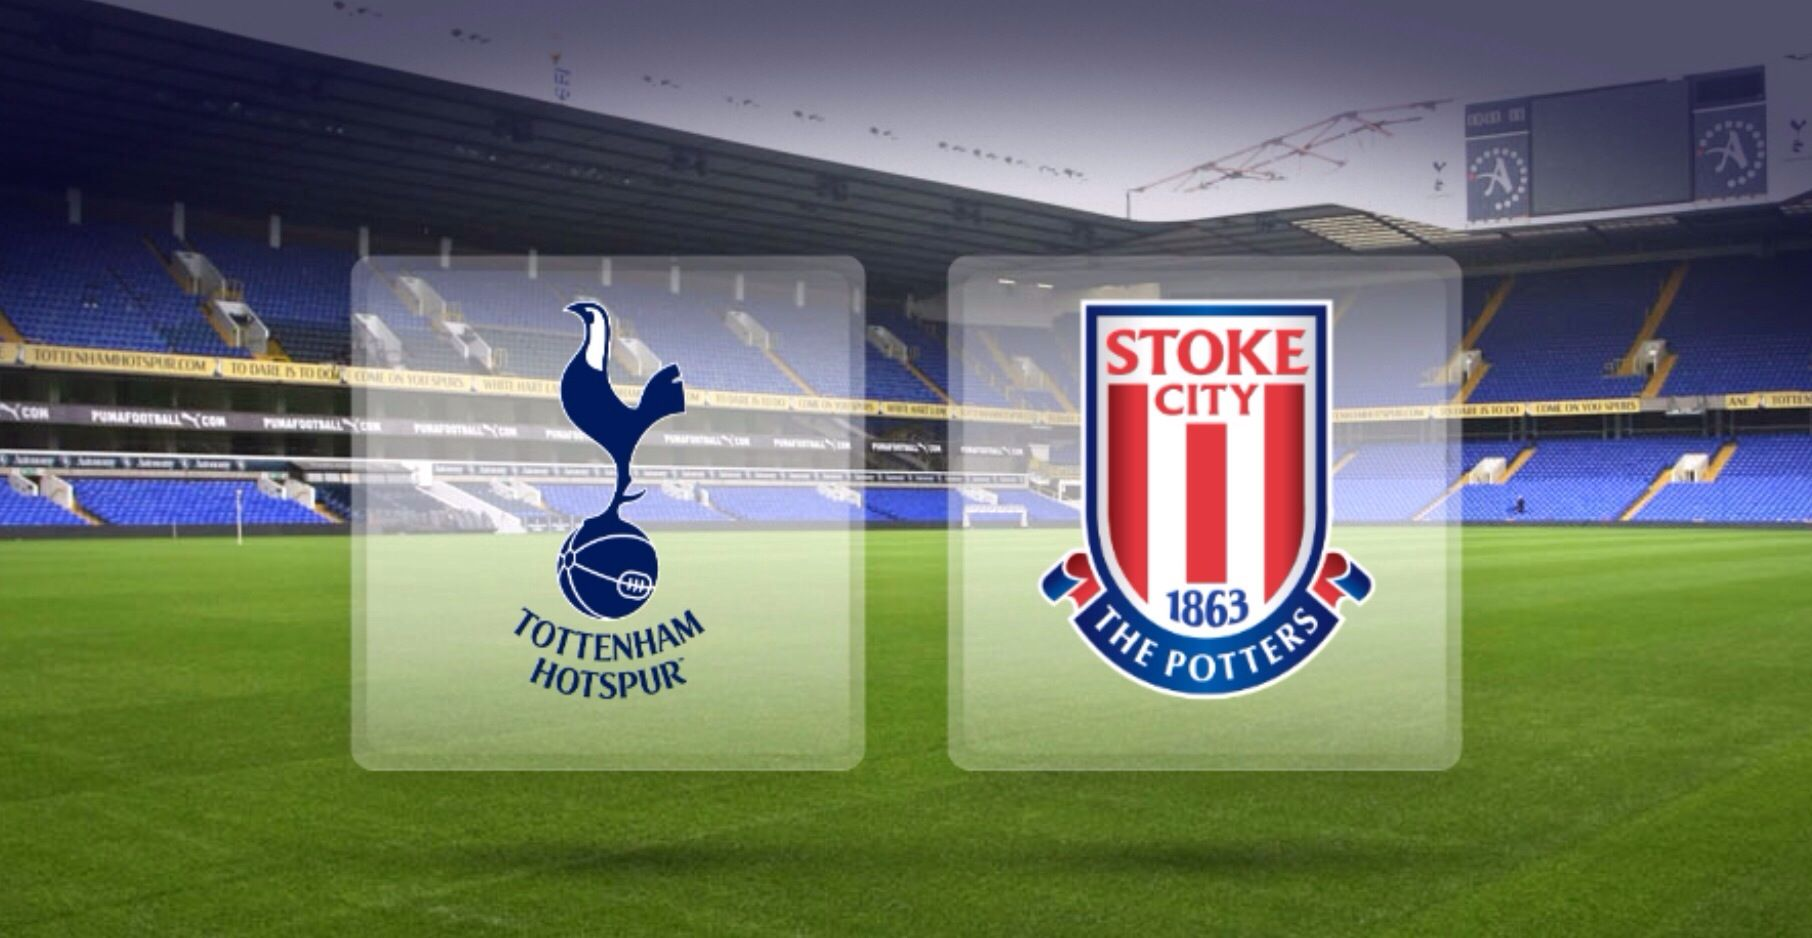 Tottenham Vs Stoke Soi Keo Ca Cược Bong đa Ngay 09 12 2017 Tottenham Hotspur Tottenham Chelsea Match